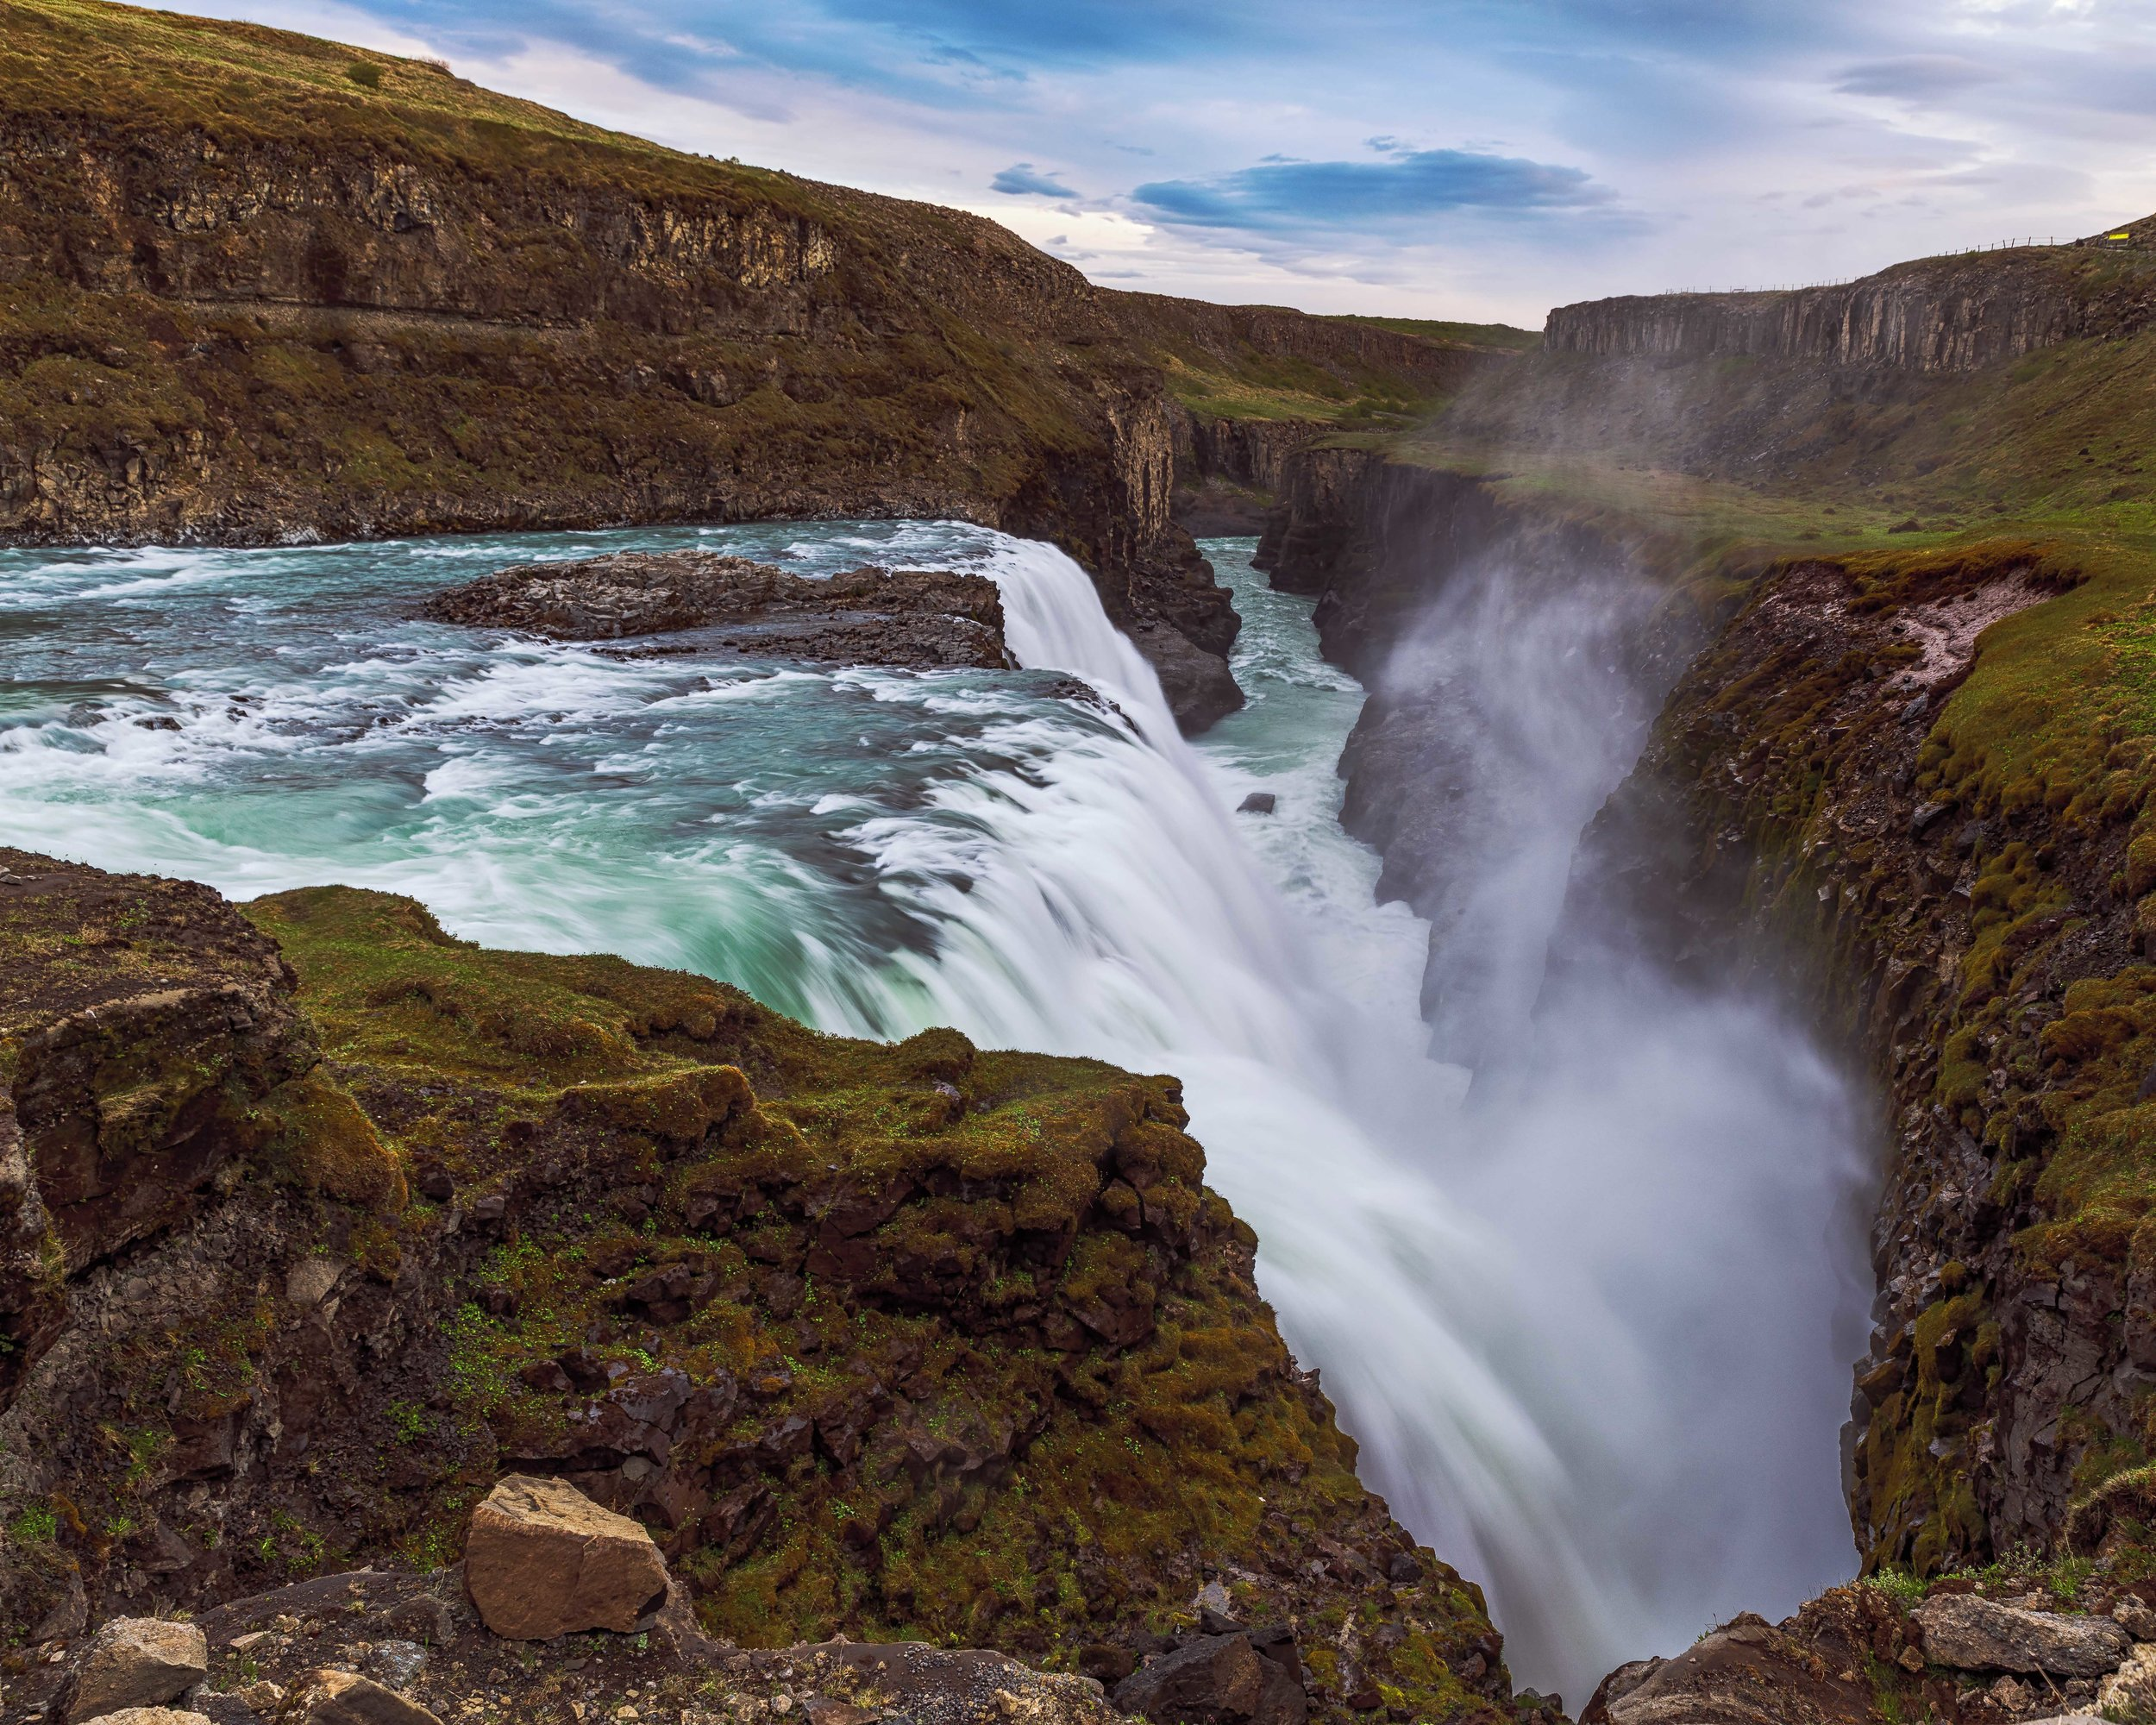 Rushing water at Gullfoss